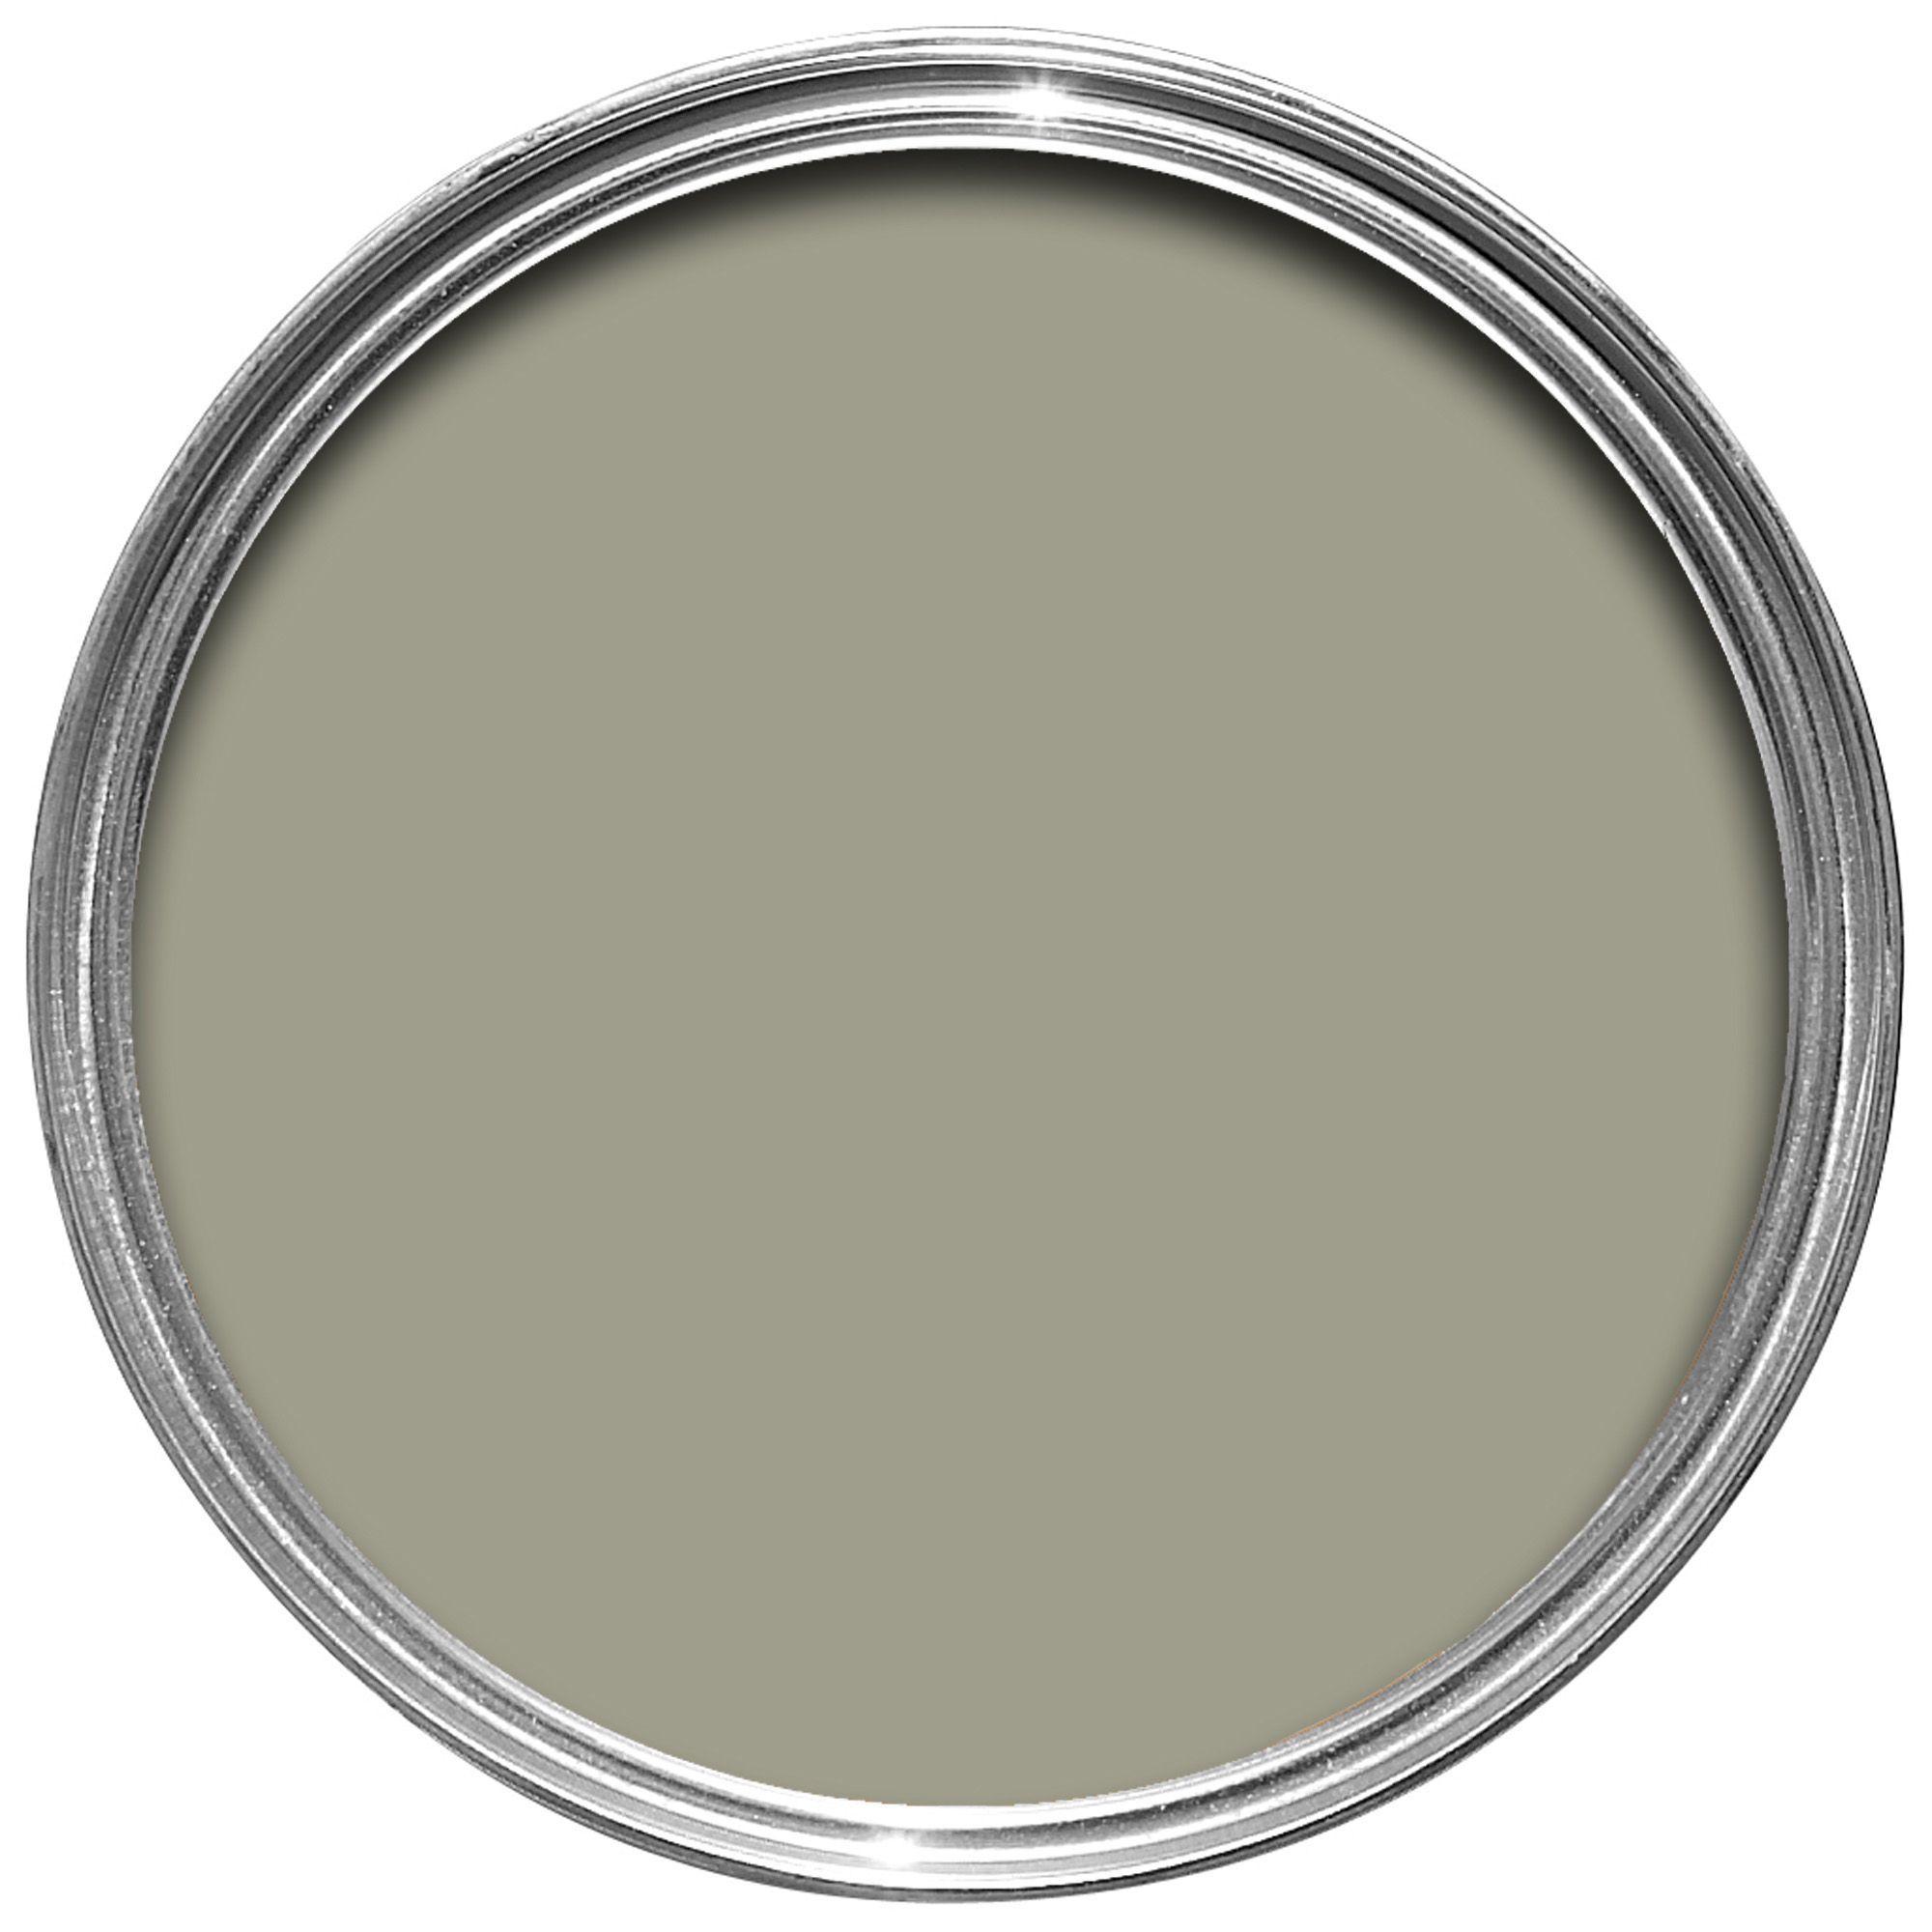 Sandtex olive green smooth matt masonry paint 5l departments diy at b q - Sandtex exterior paint ideas ...